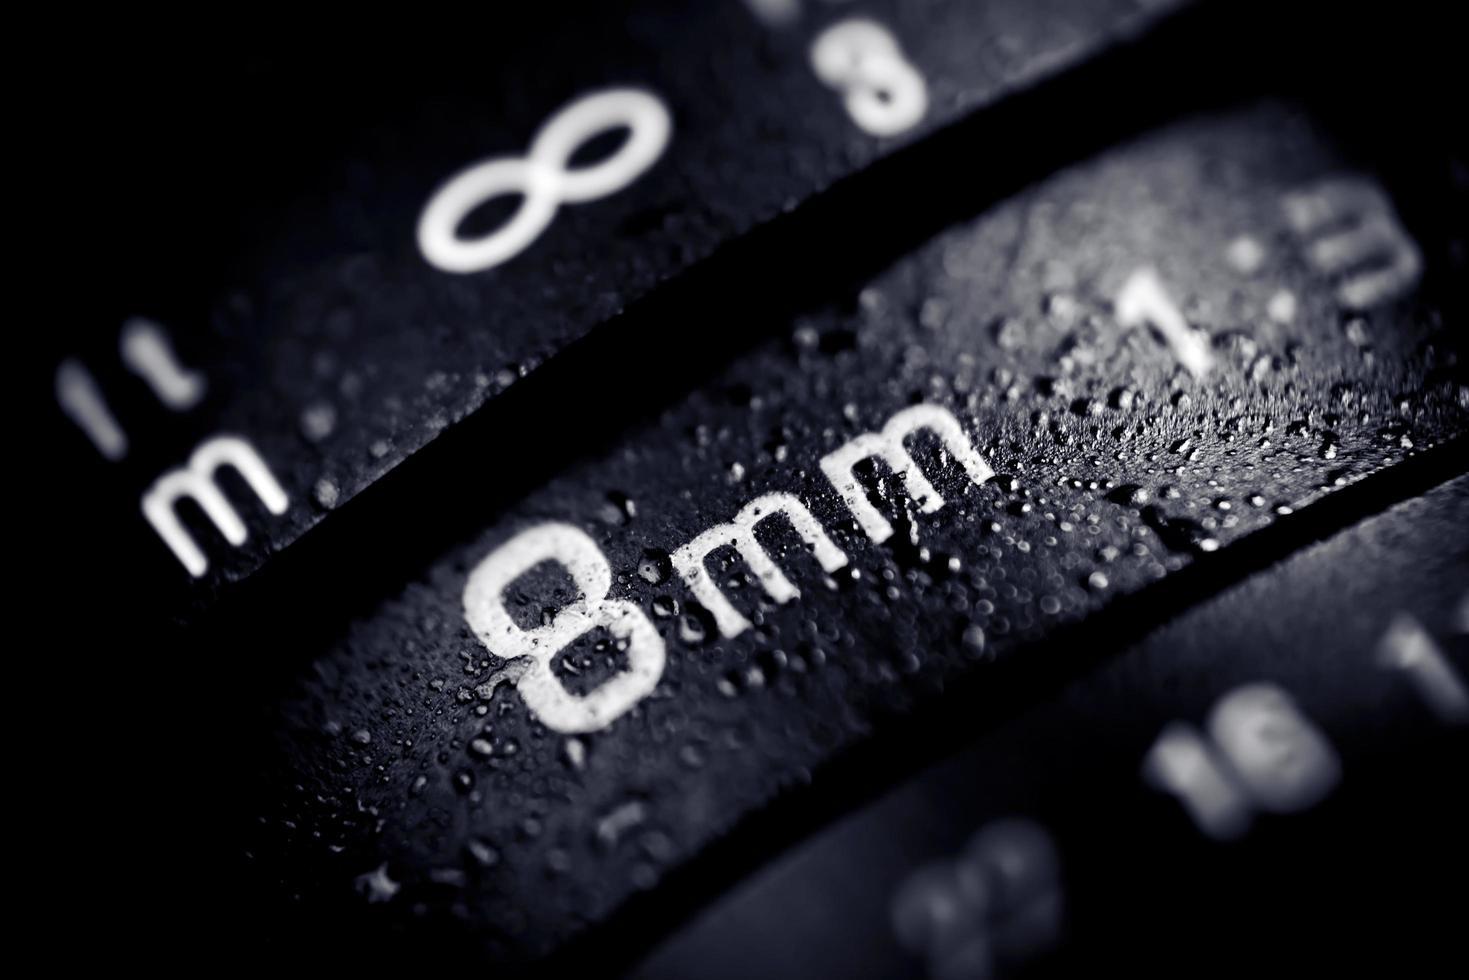 8 mm digitale cameralens foto